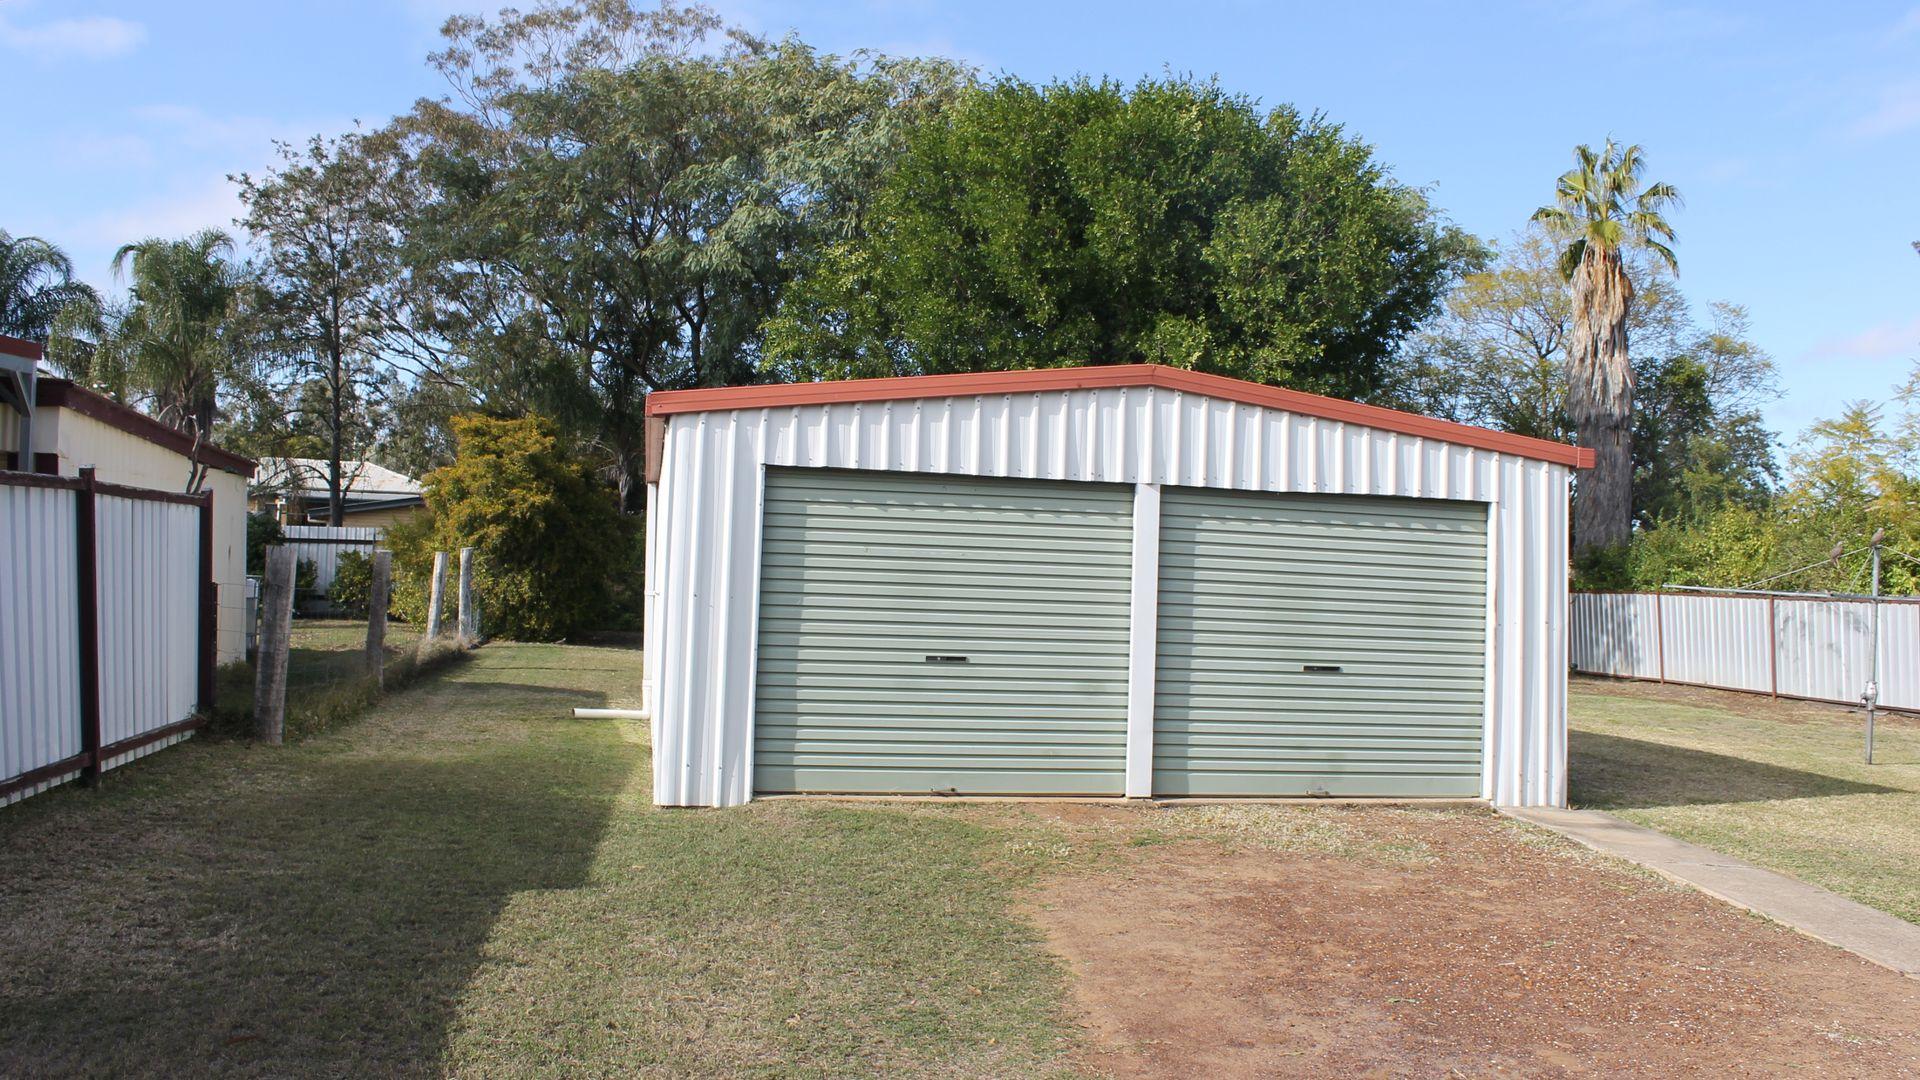 33 Garrow Street, Dalby QLD 4405, Image 1